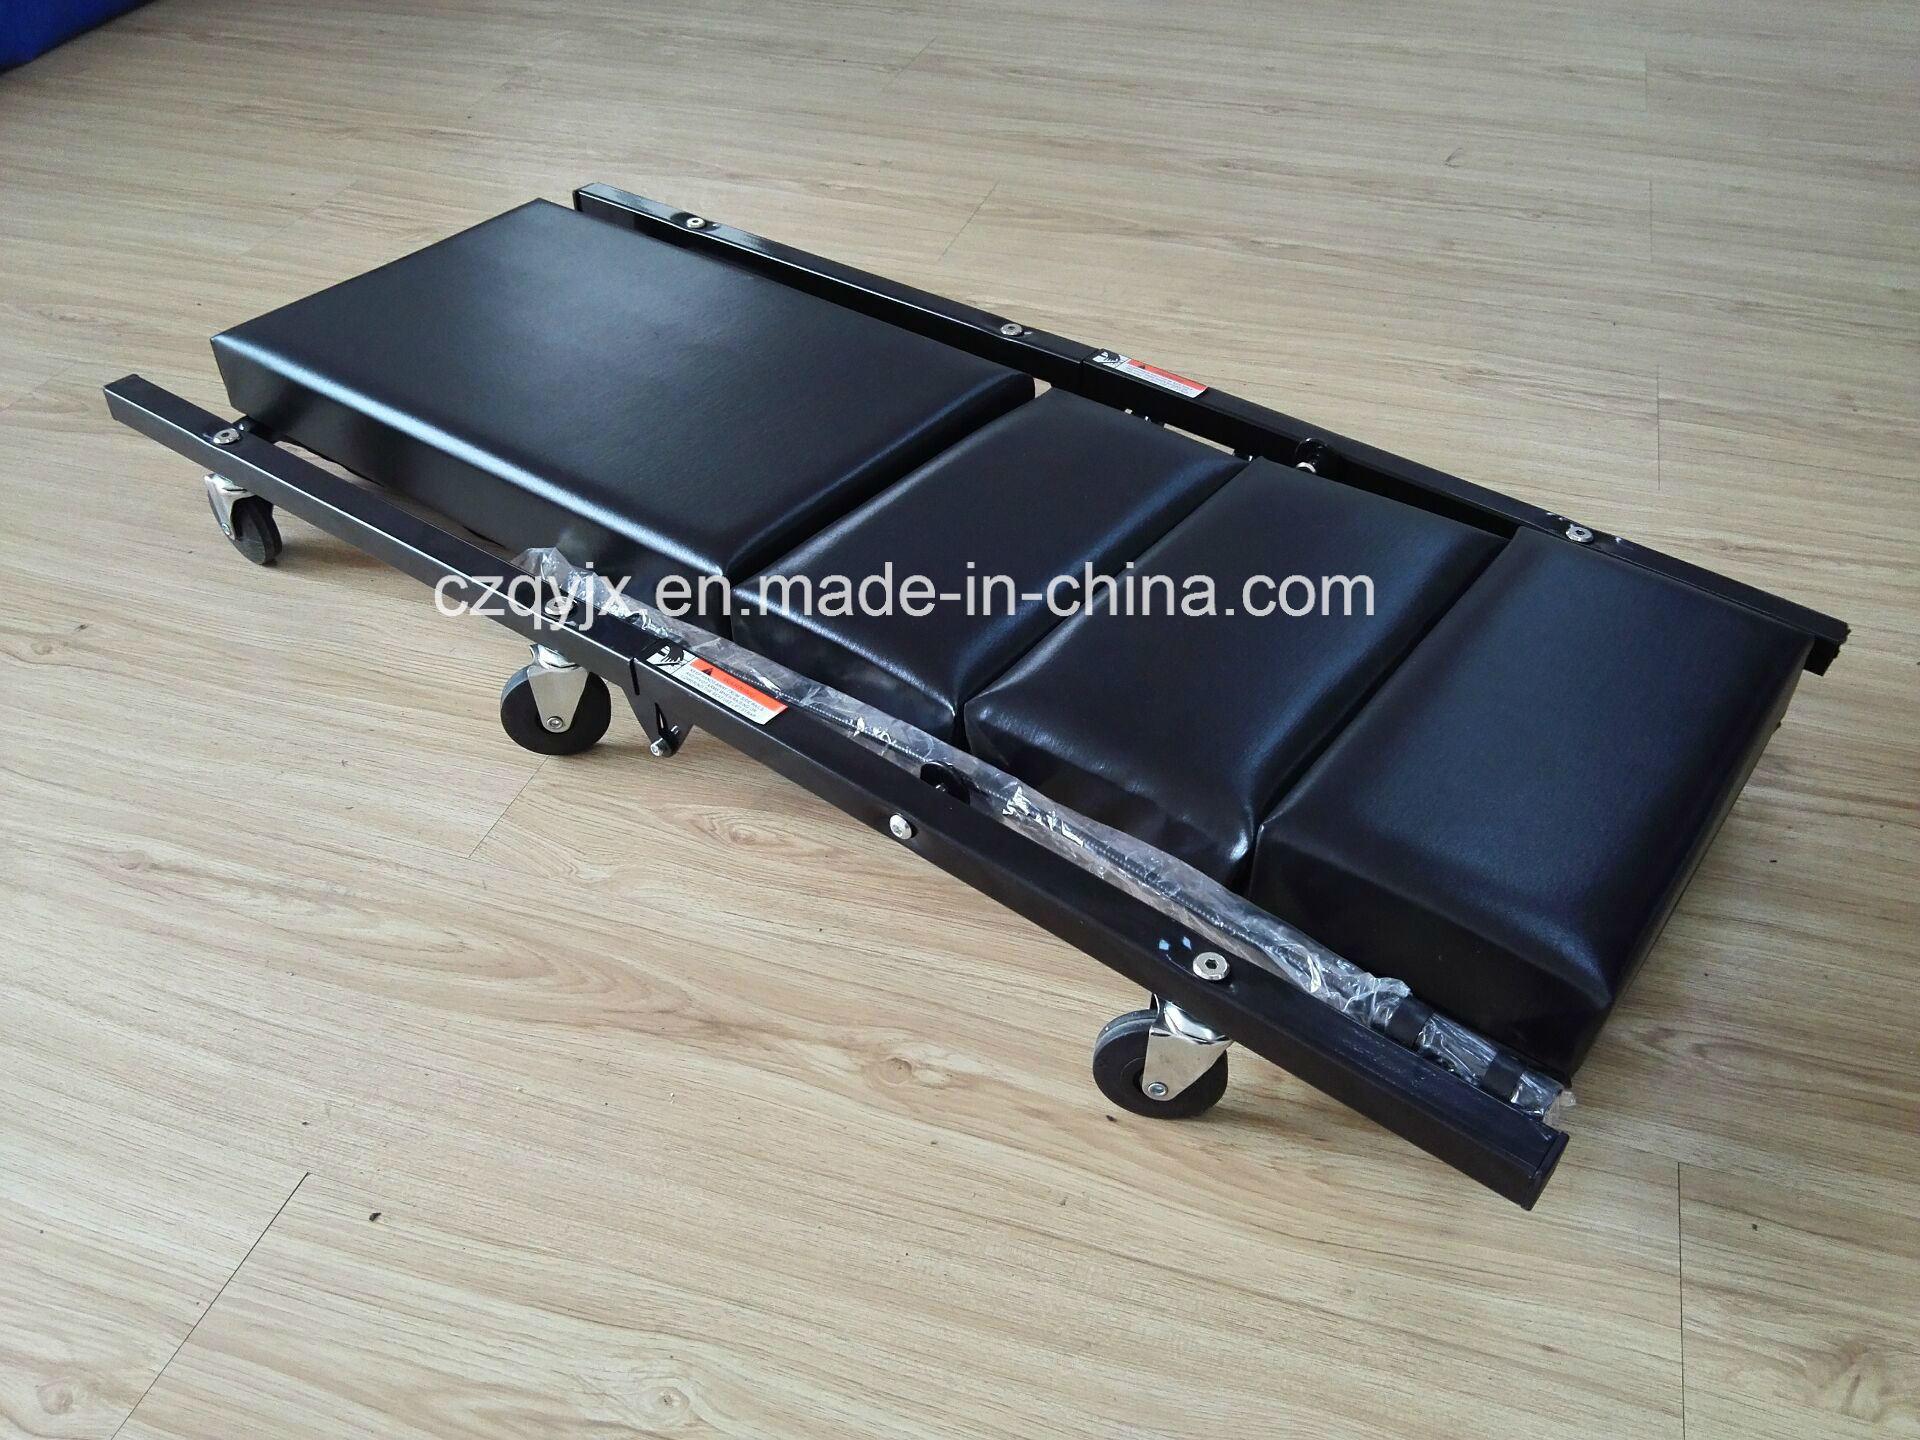 40 Inch Foldable Adjustable Headrest Creeper